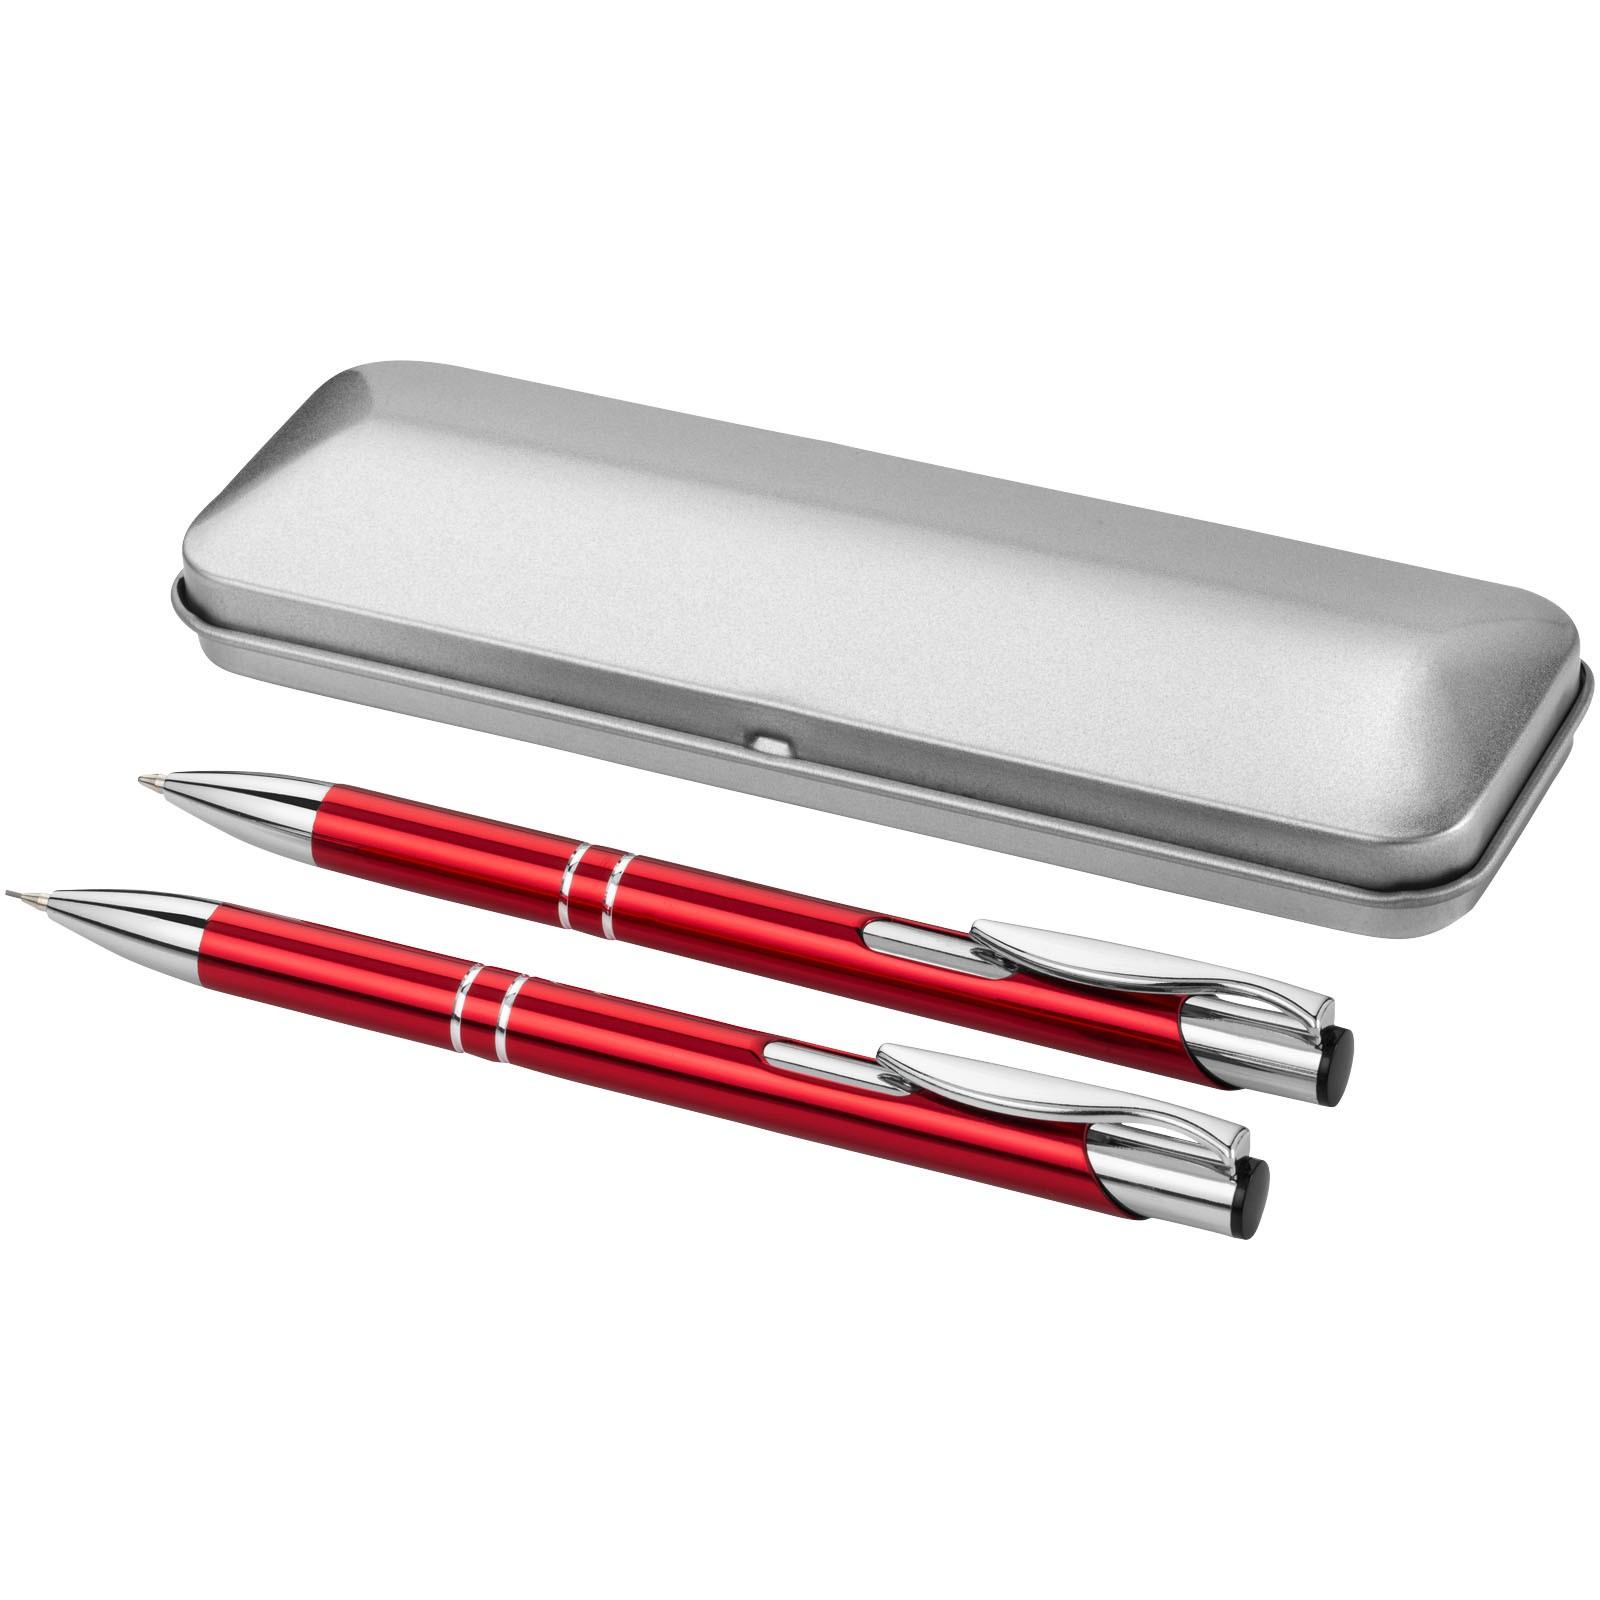 Dublin writing set - Red / Silver